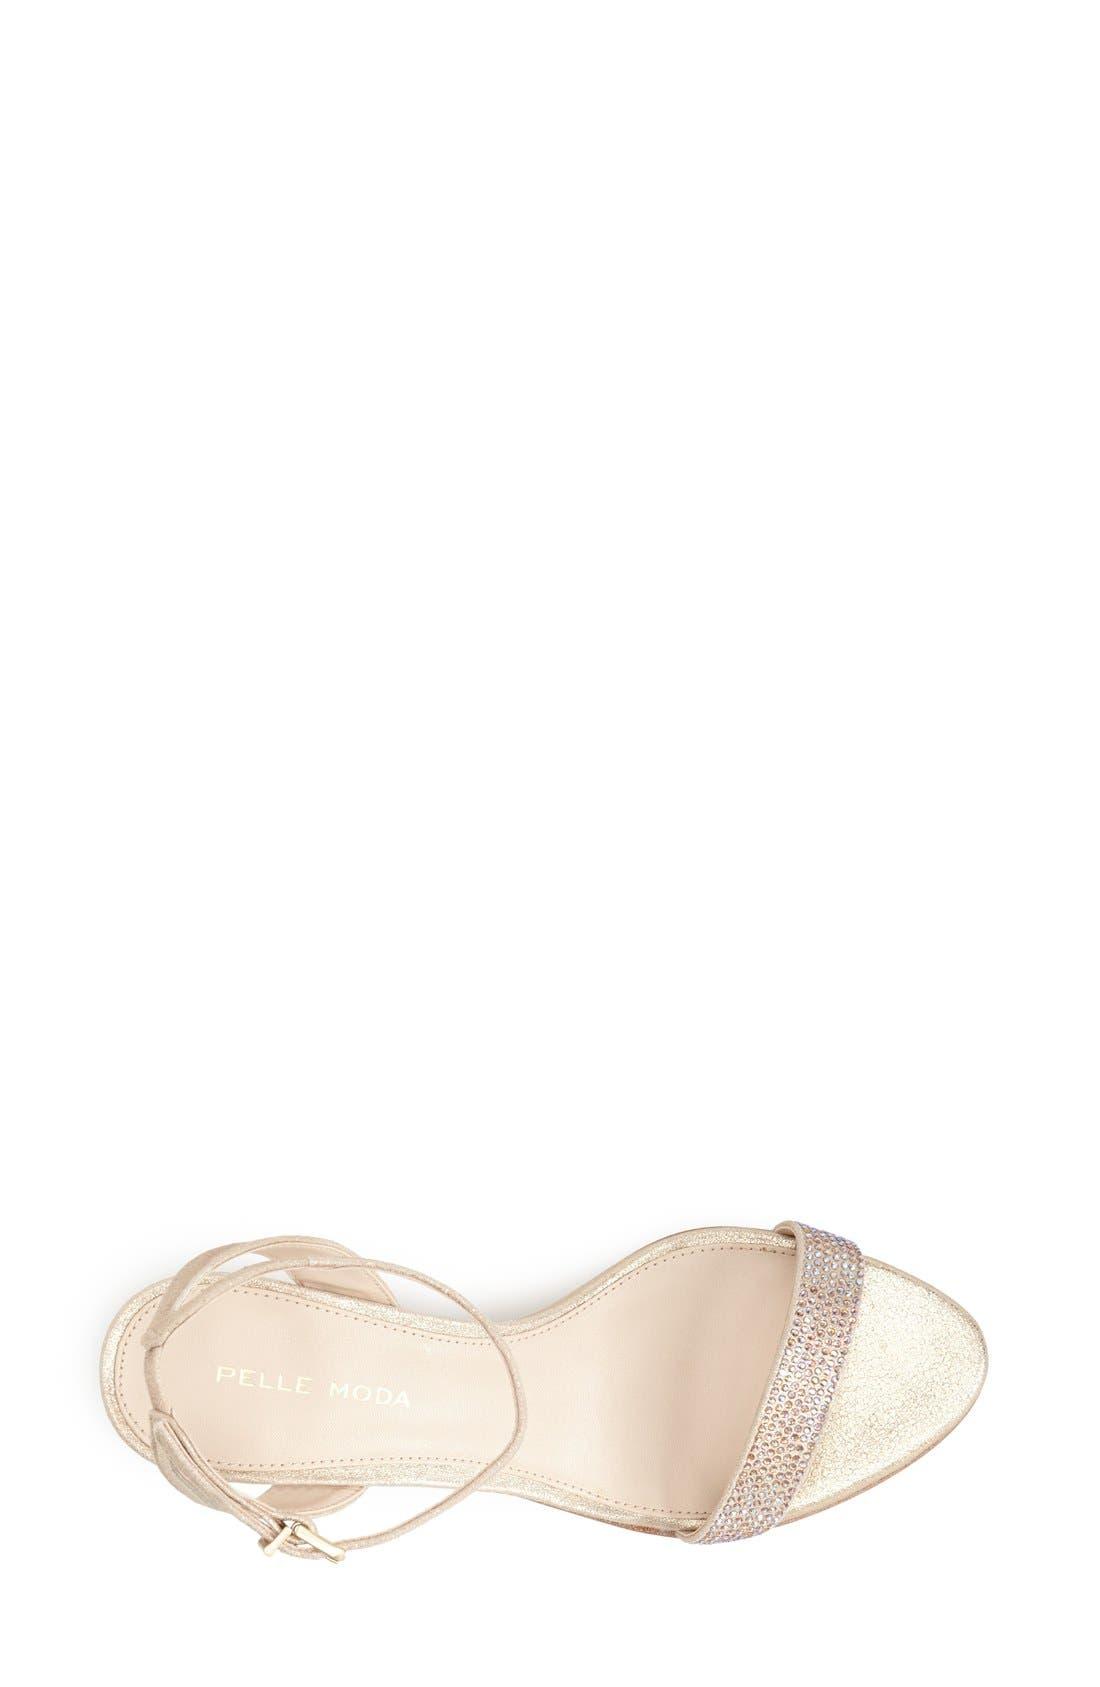 Alternate Image 3  - Pelle Moda 'Fabia' Sandal (Women)